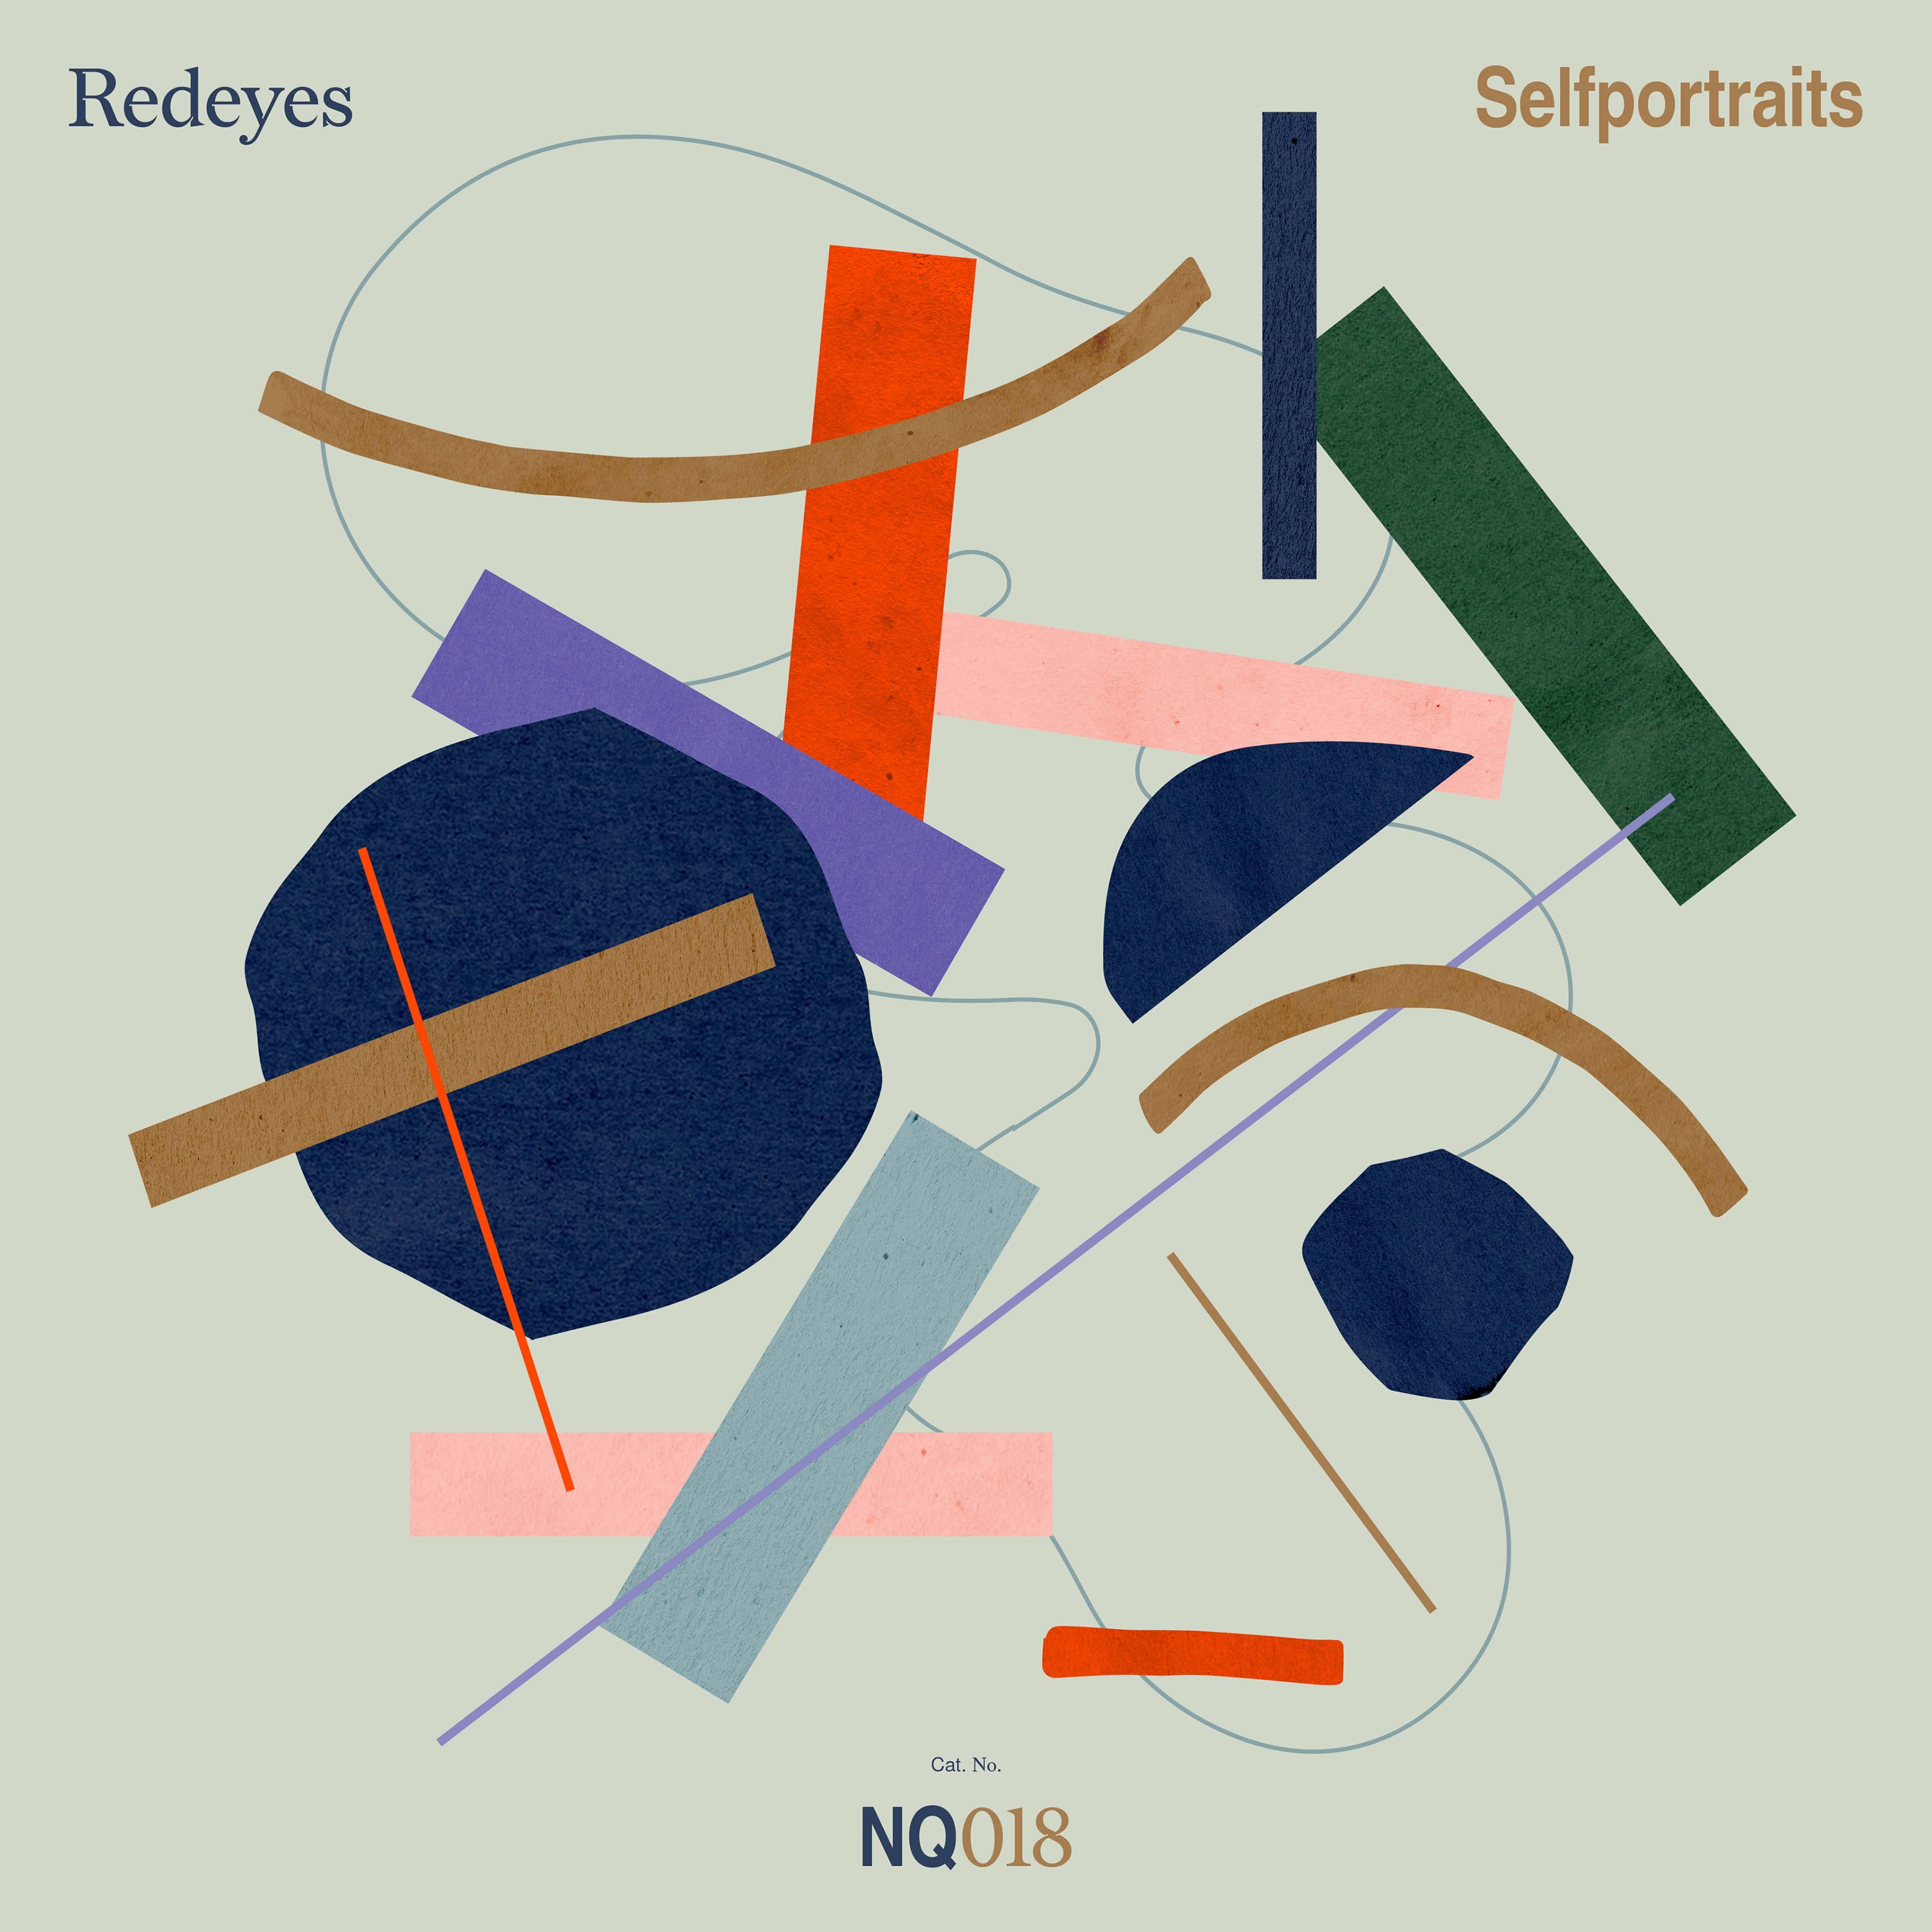 Redeyes - Selfportraits